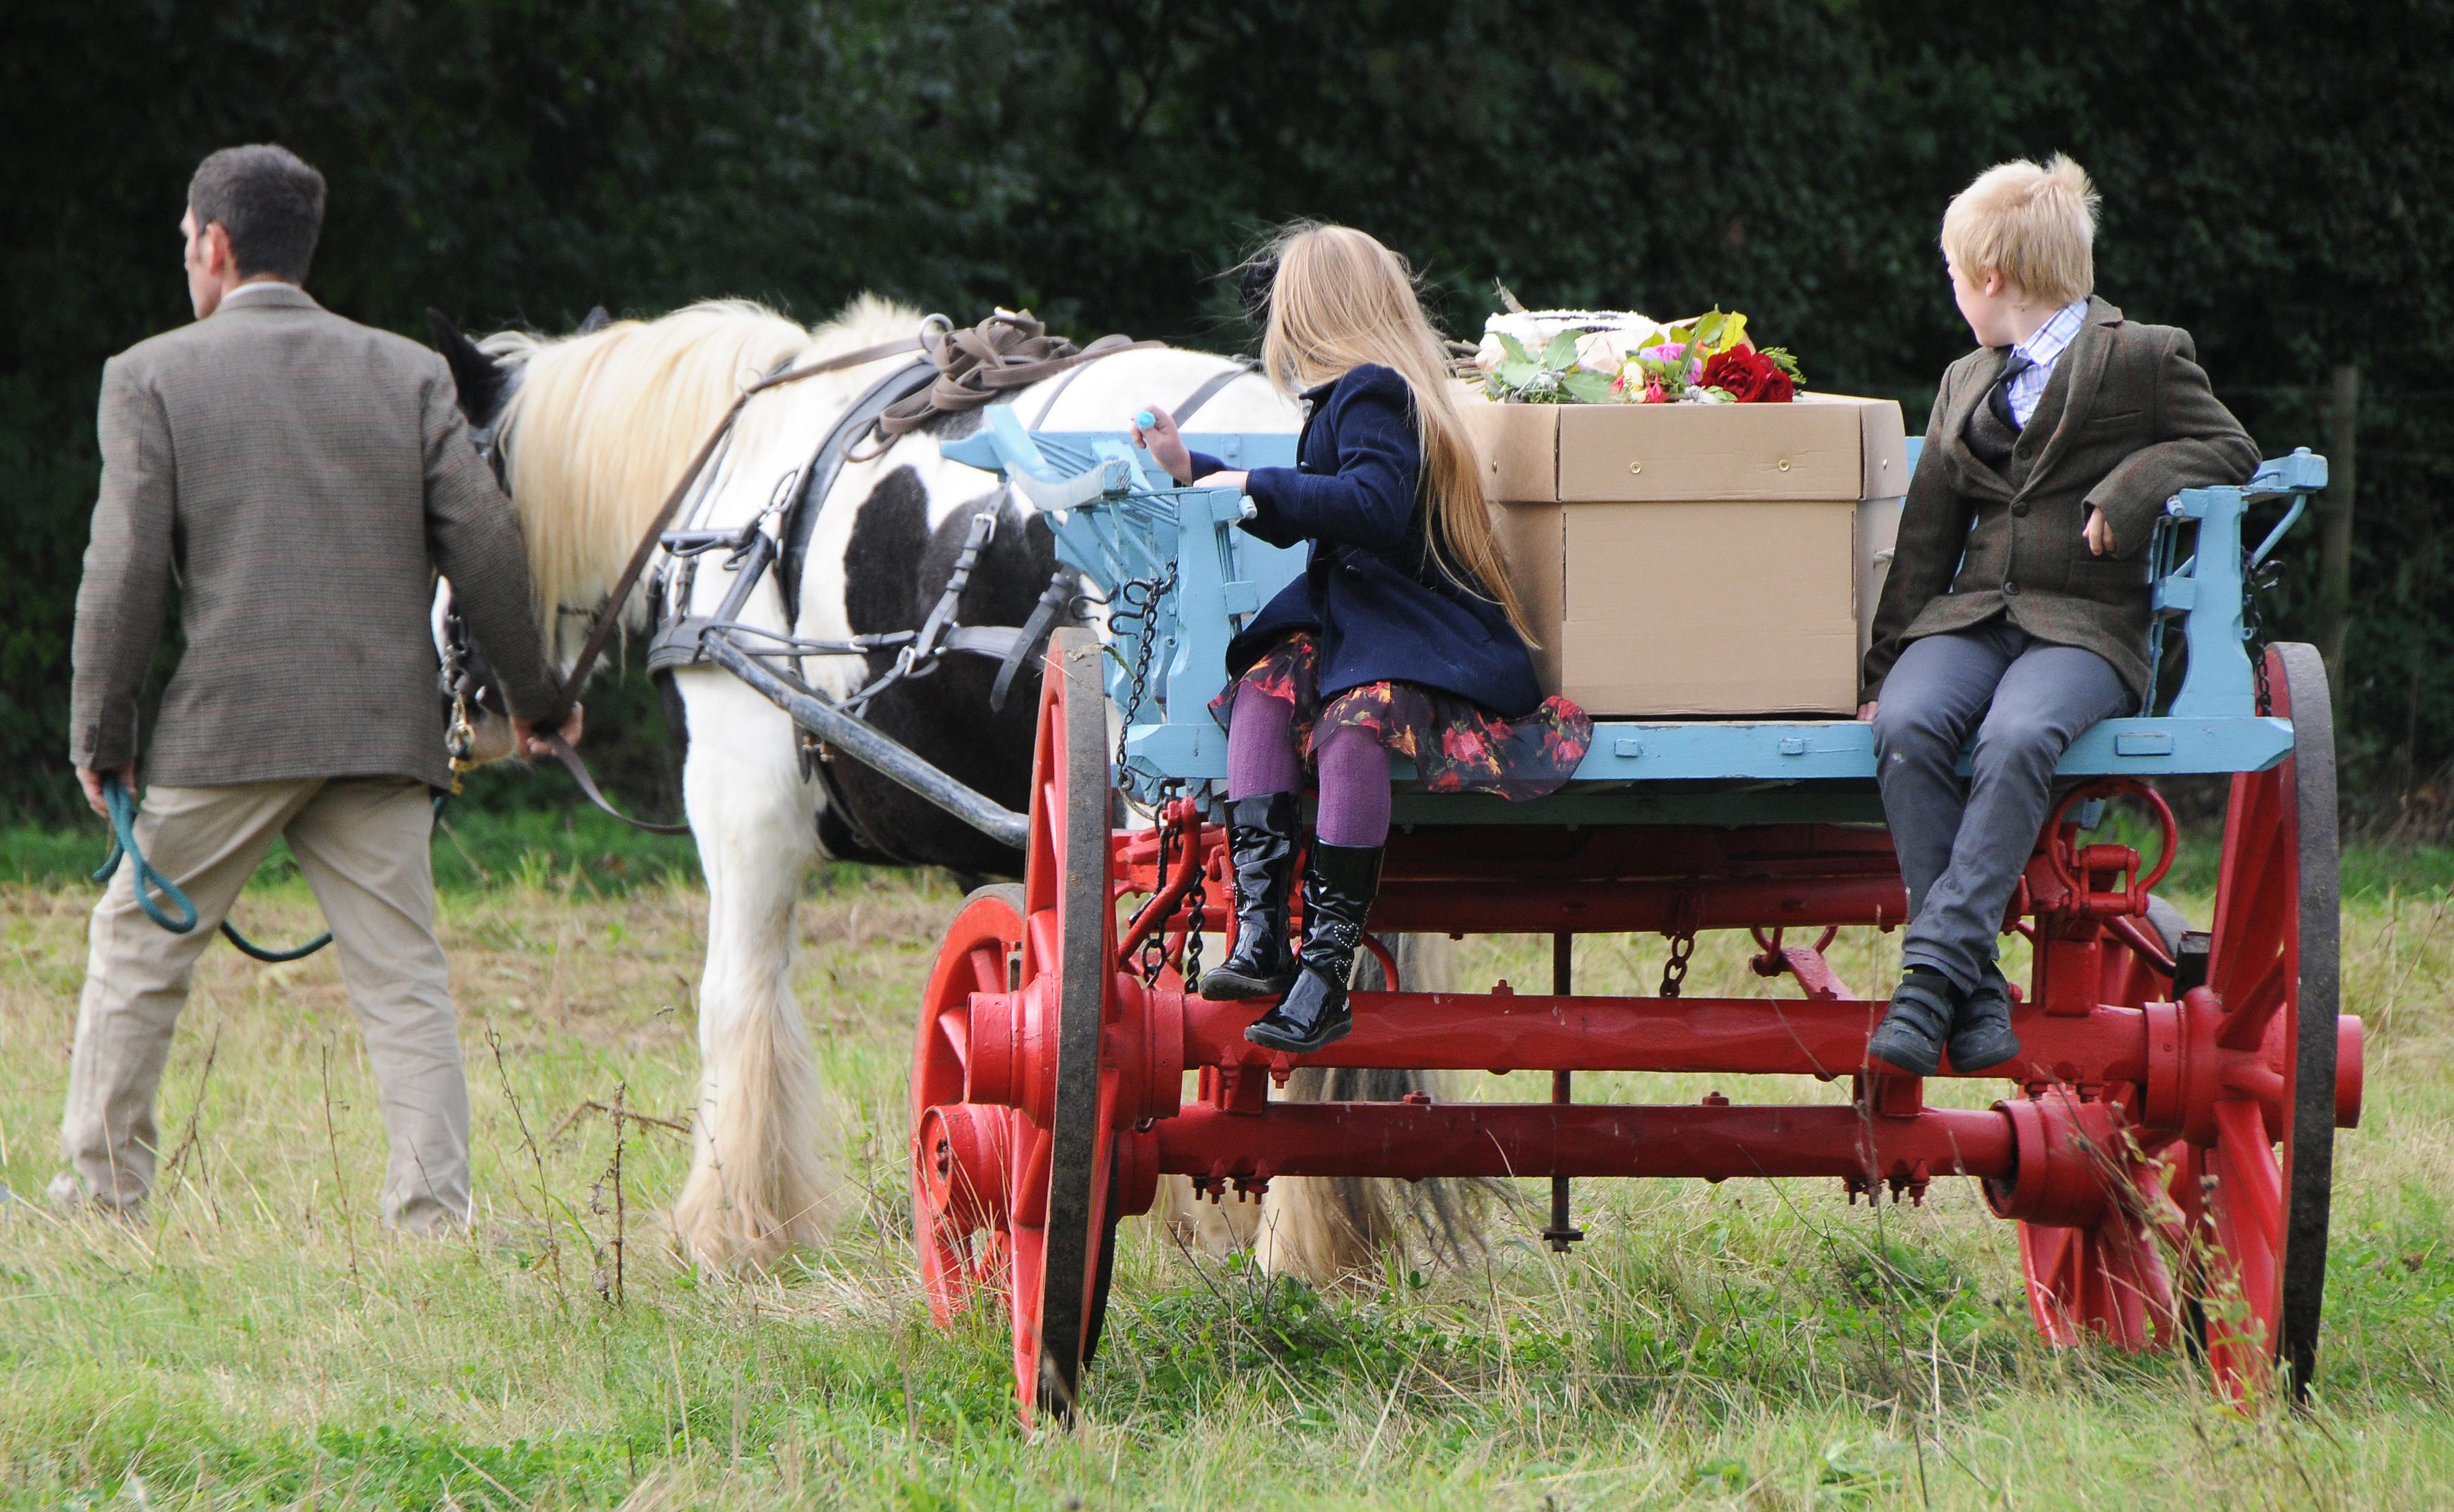 A Natural Burial at Clandon Wood Surrey Hills Natural Burial Reserve photo by Dani Maimone